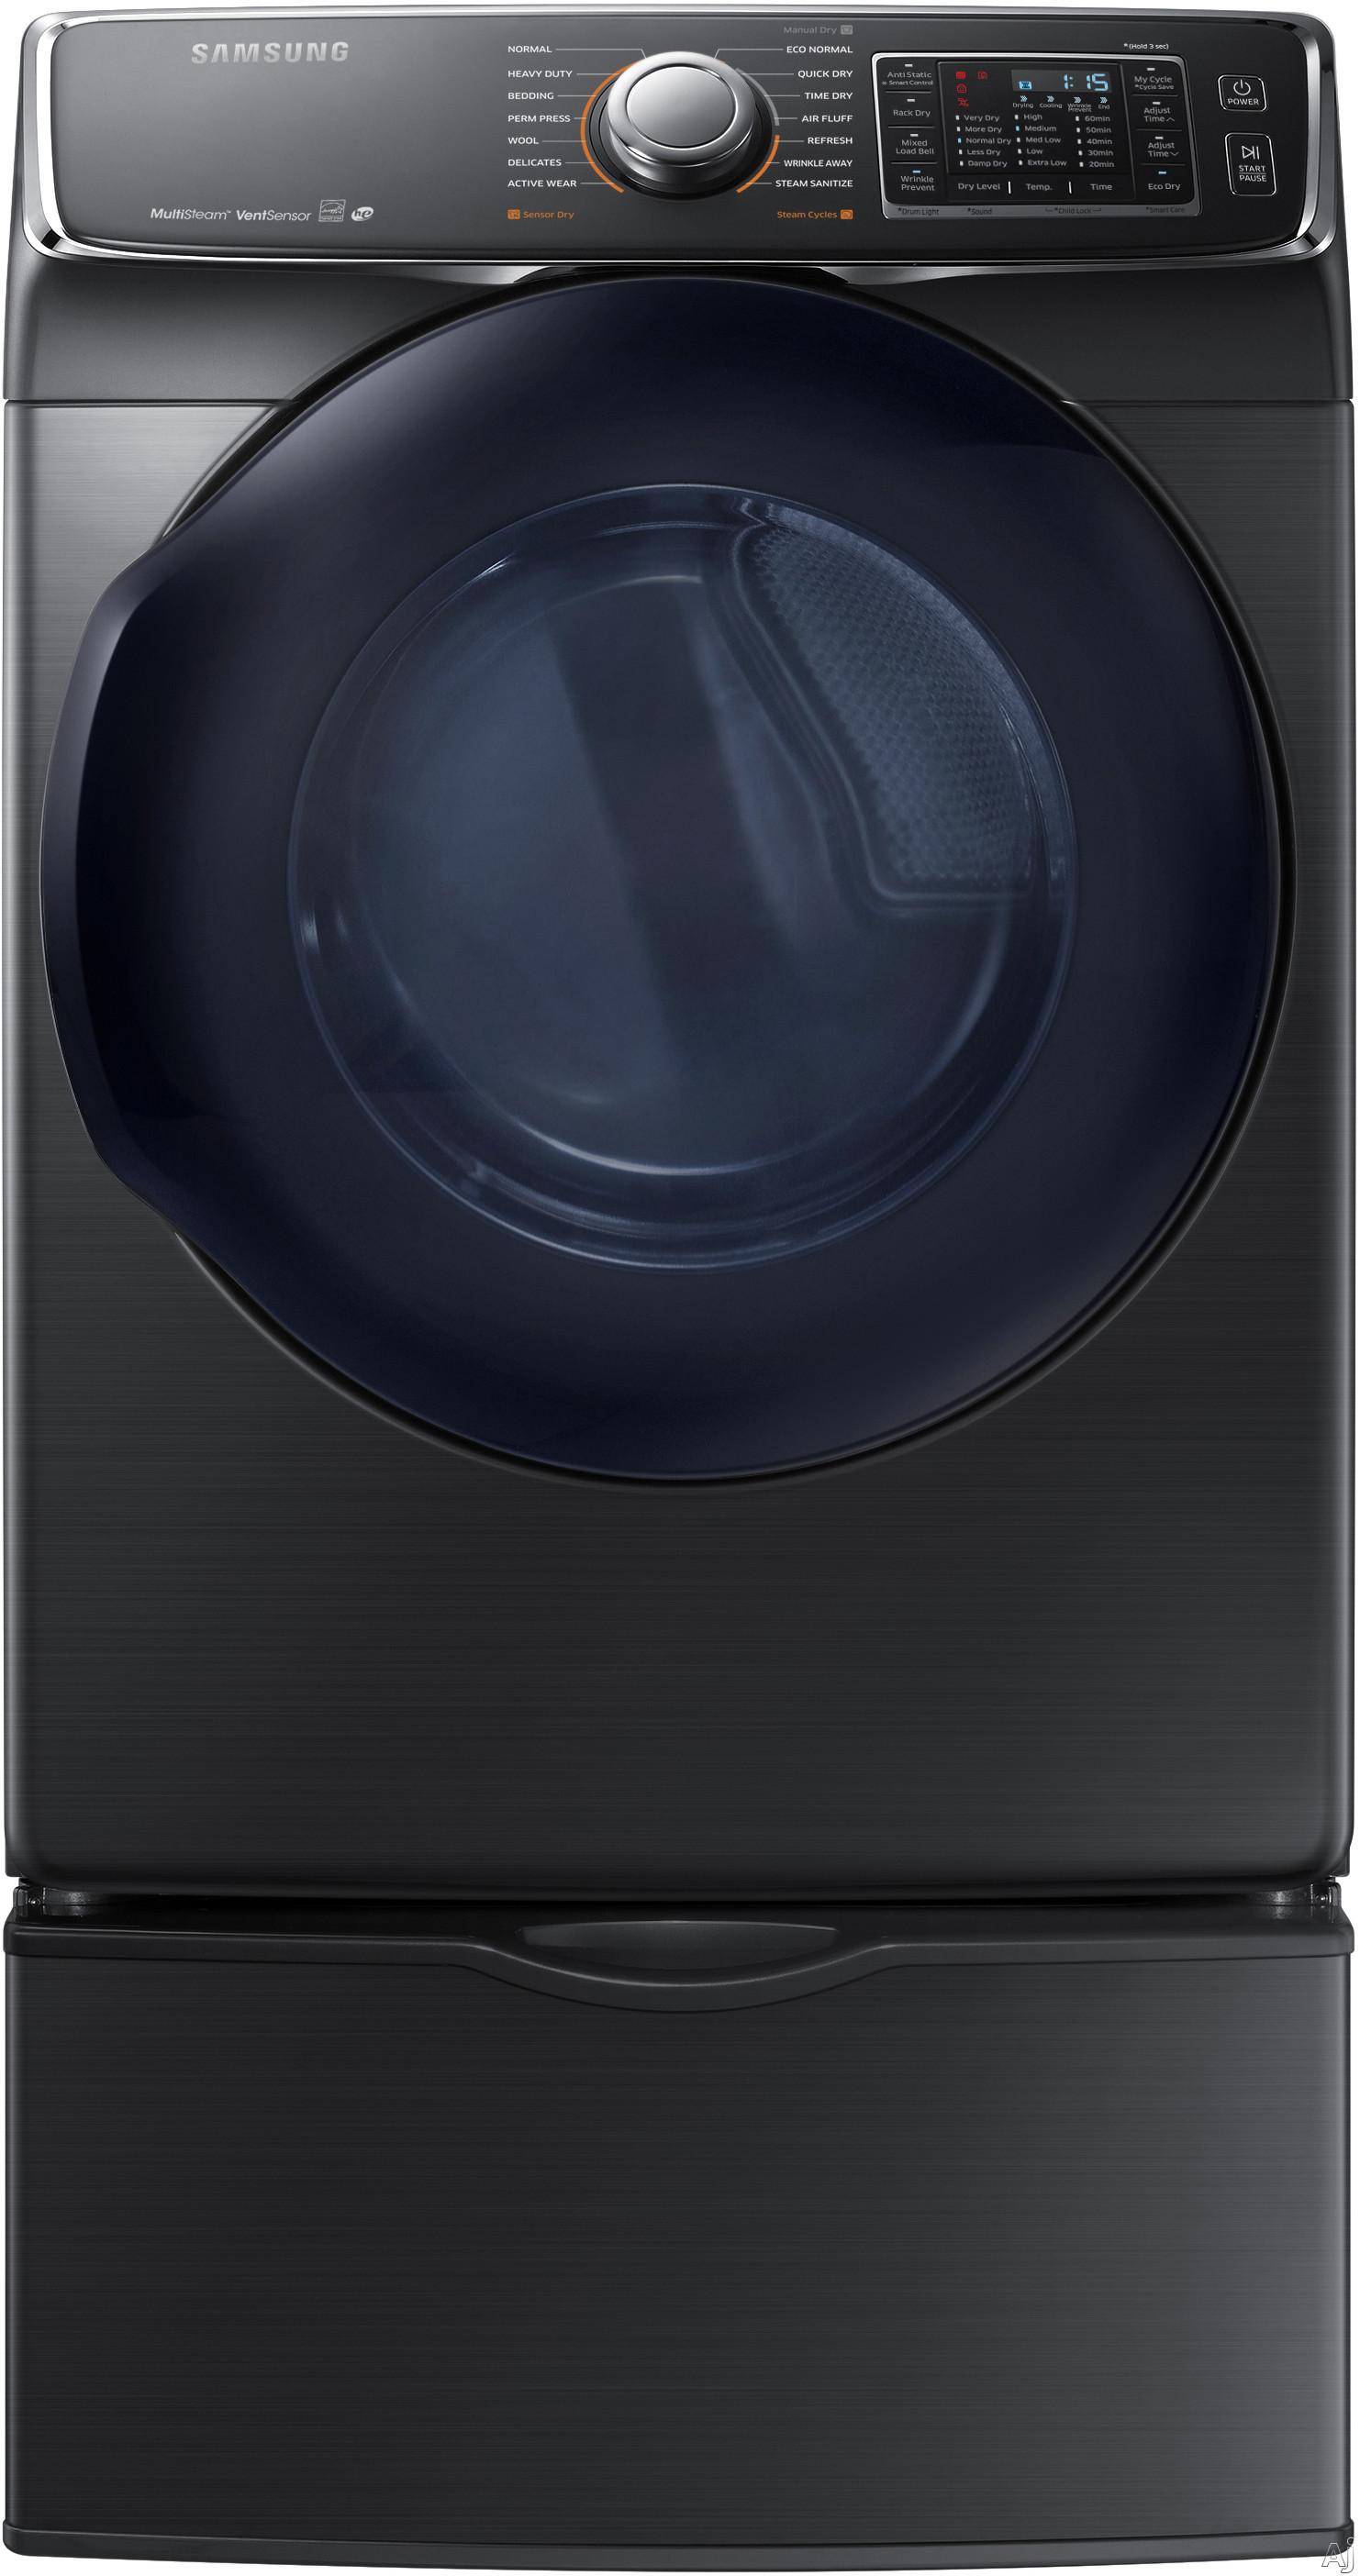 Samsung Laundry,Samsung Dryers,Samsung Electric Dryers